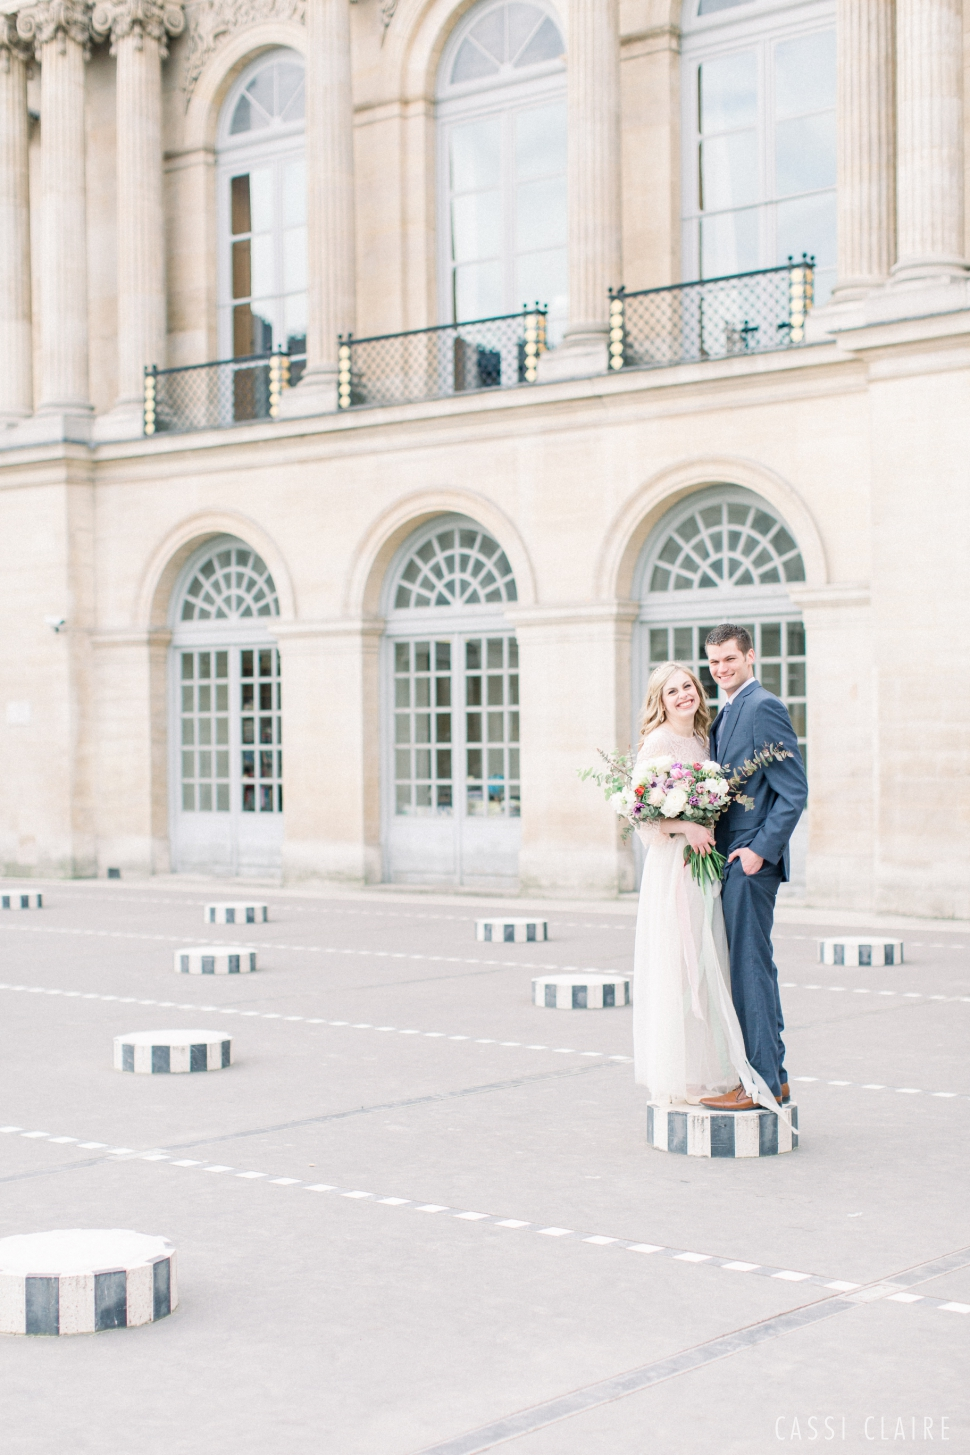 Paris-France-Wedding_CassiClaire_39.jpg